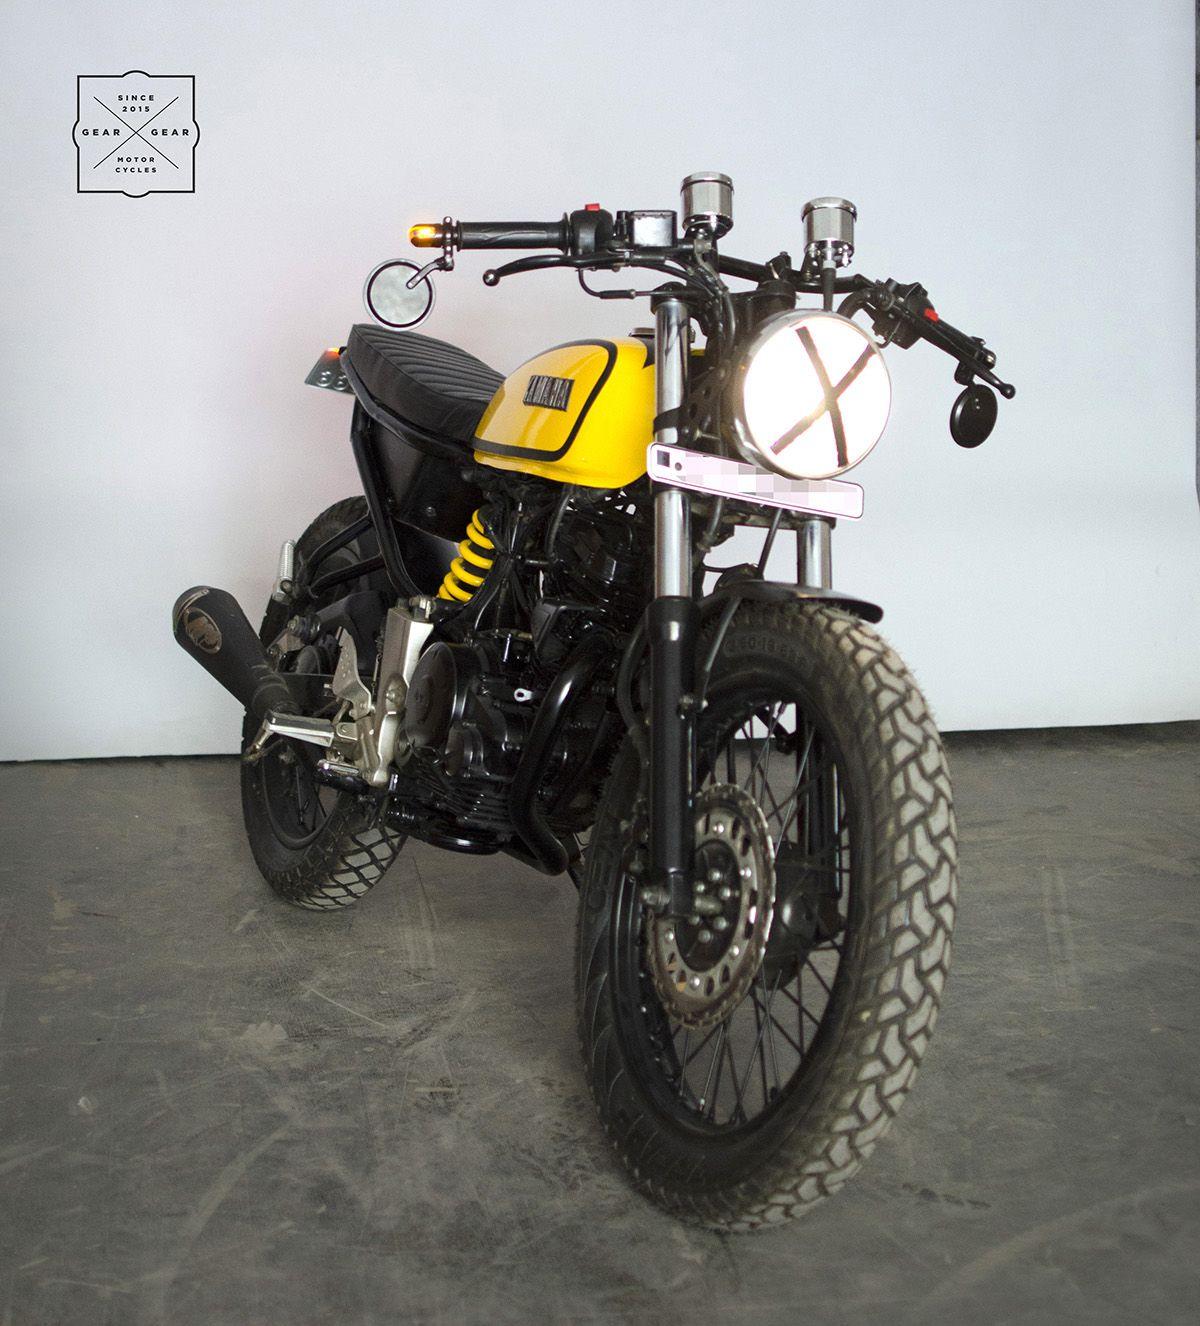 55 Mejores Imagenes De Yamaha Rx En 2020 Motos Yamaha Motos Dt